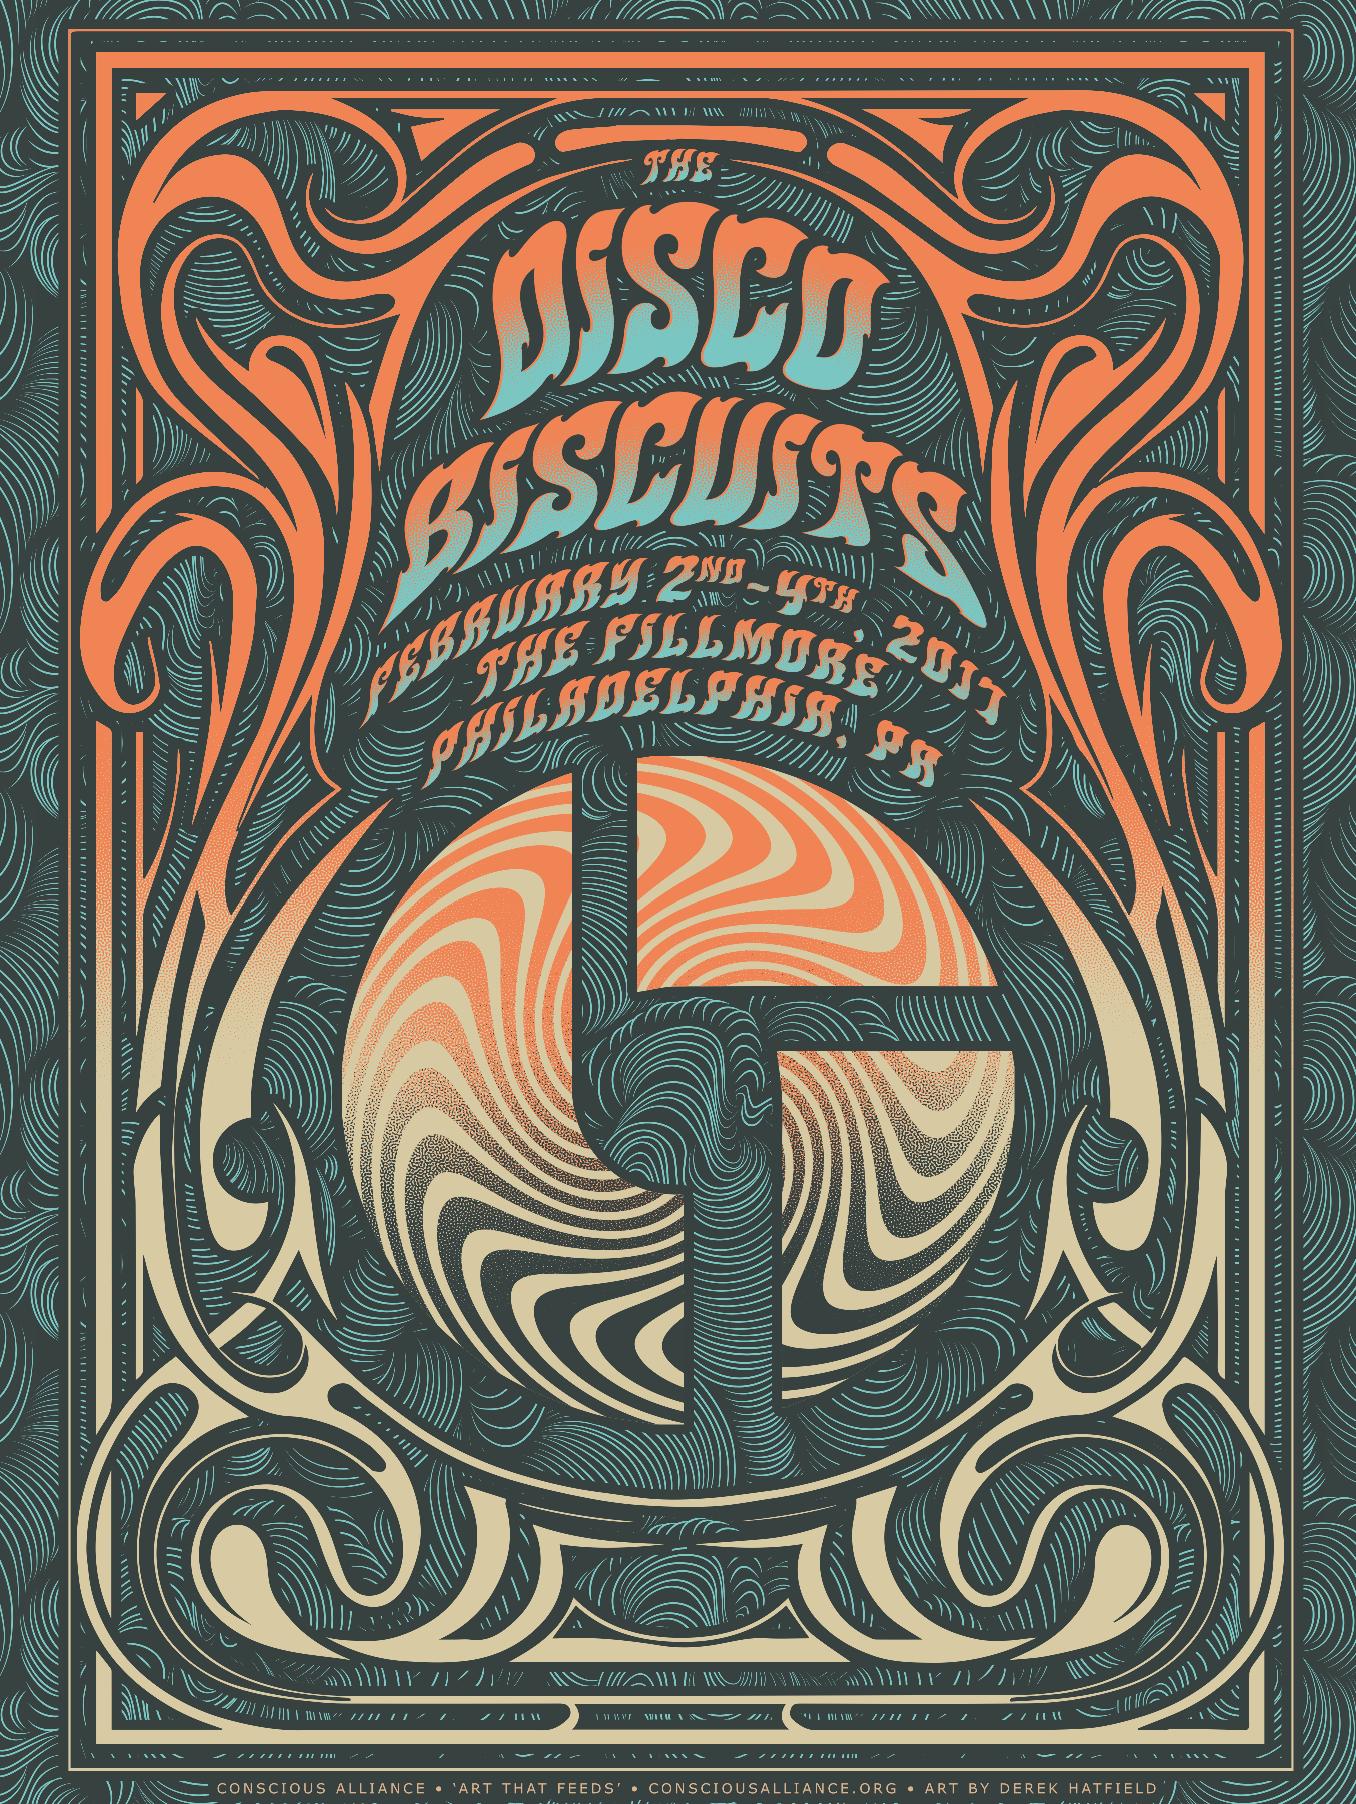 Disco Biscuits - 2.2-4.2017